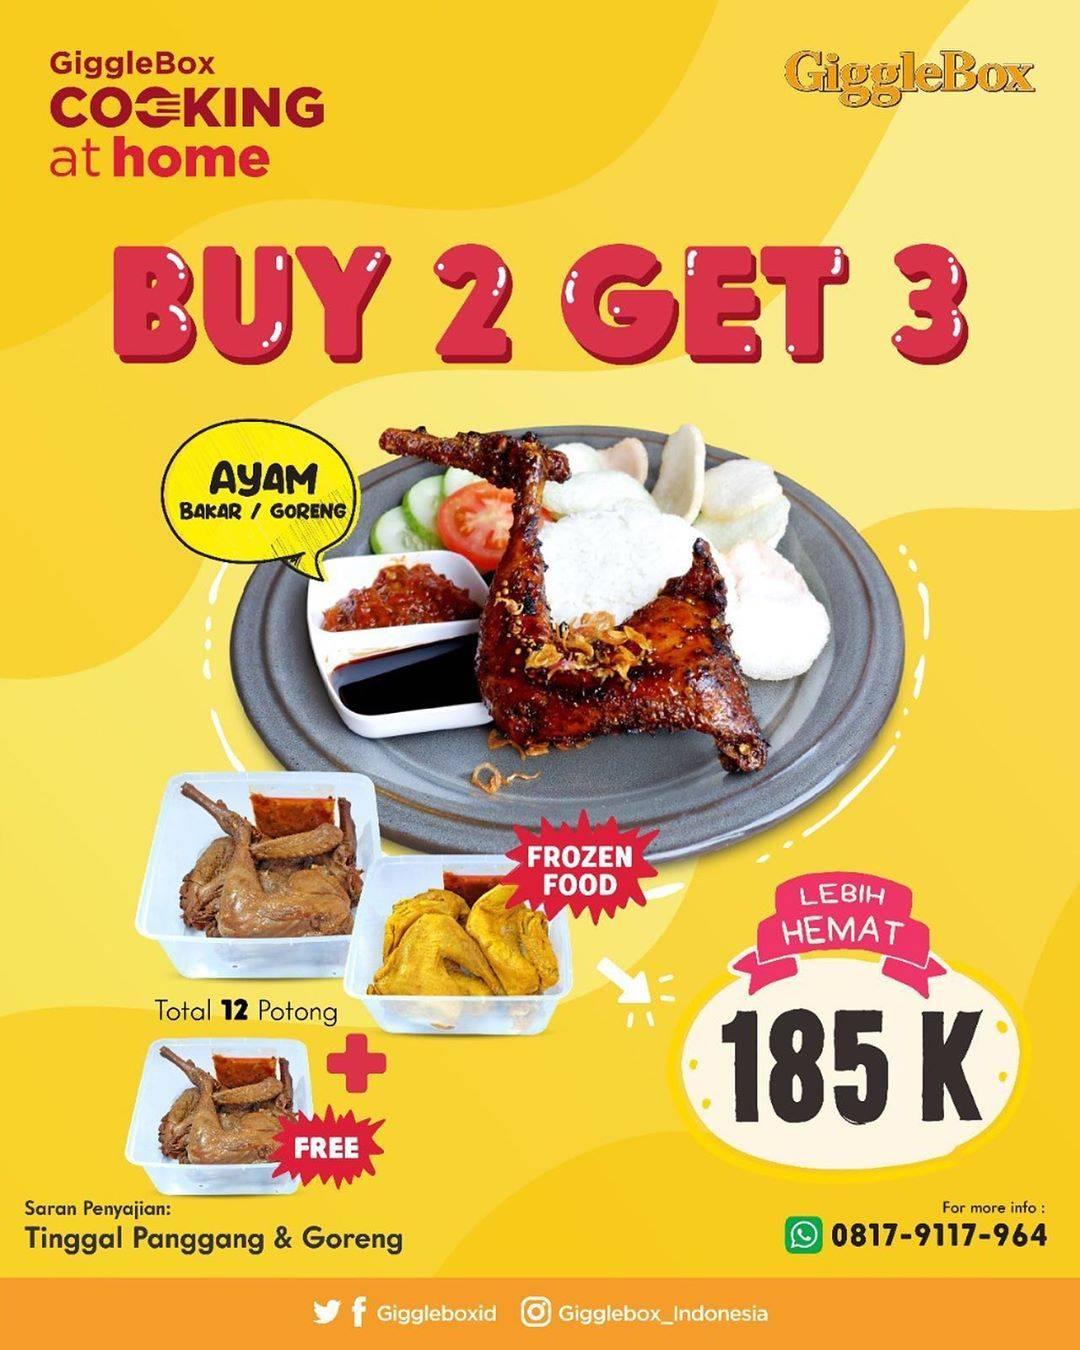 Diskon Giggle Box Promo Beli 2 Gratis 3 Ayam Bakar/Goreng